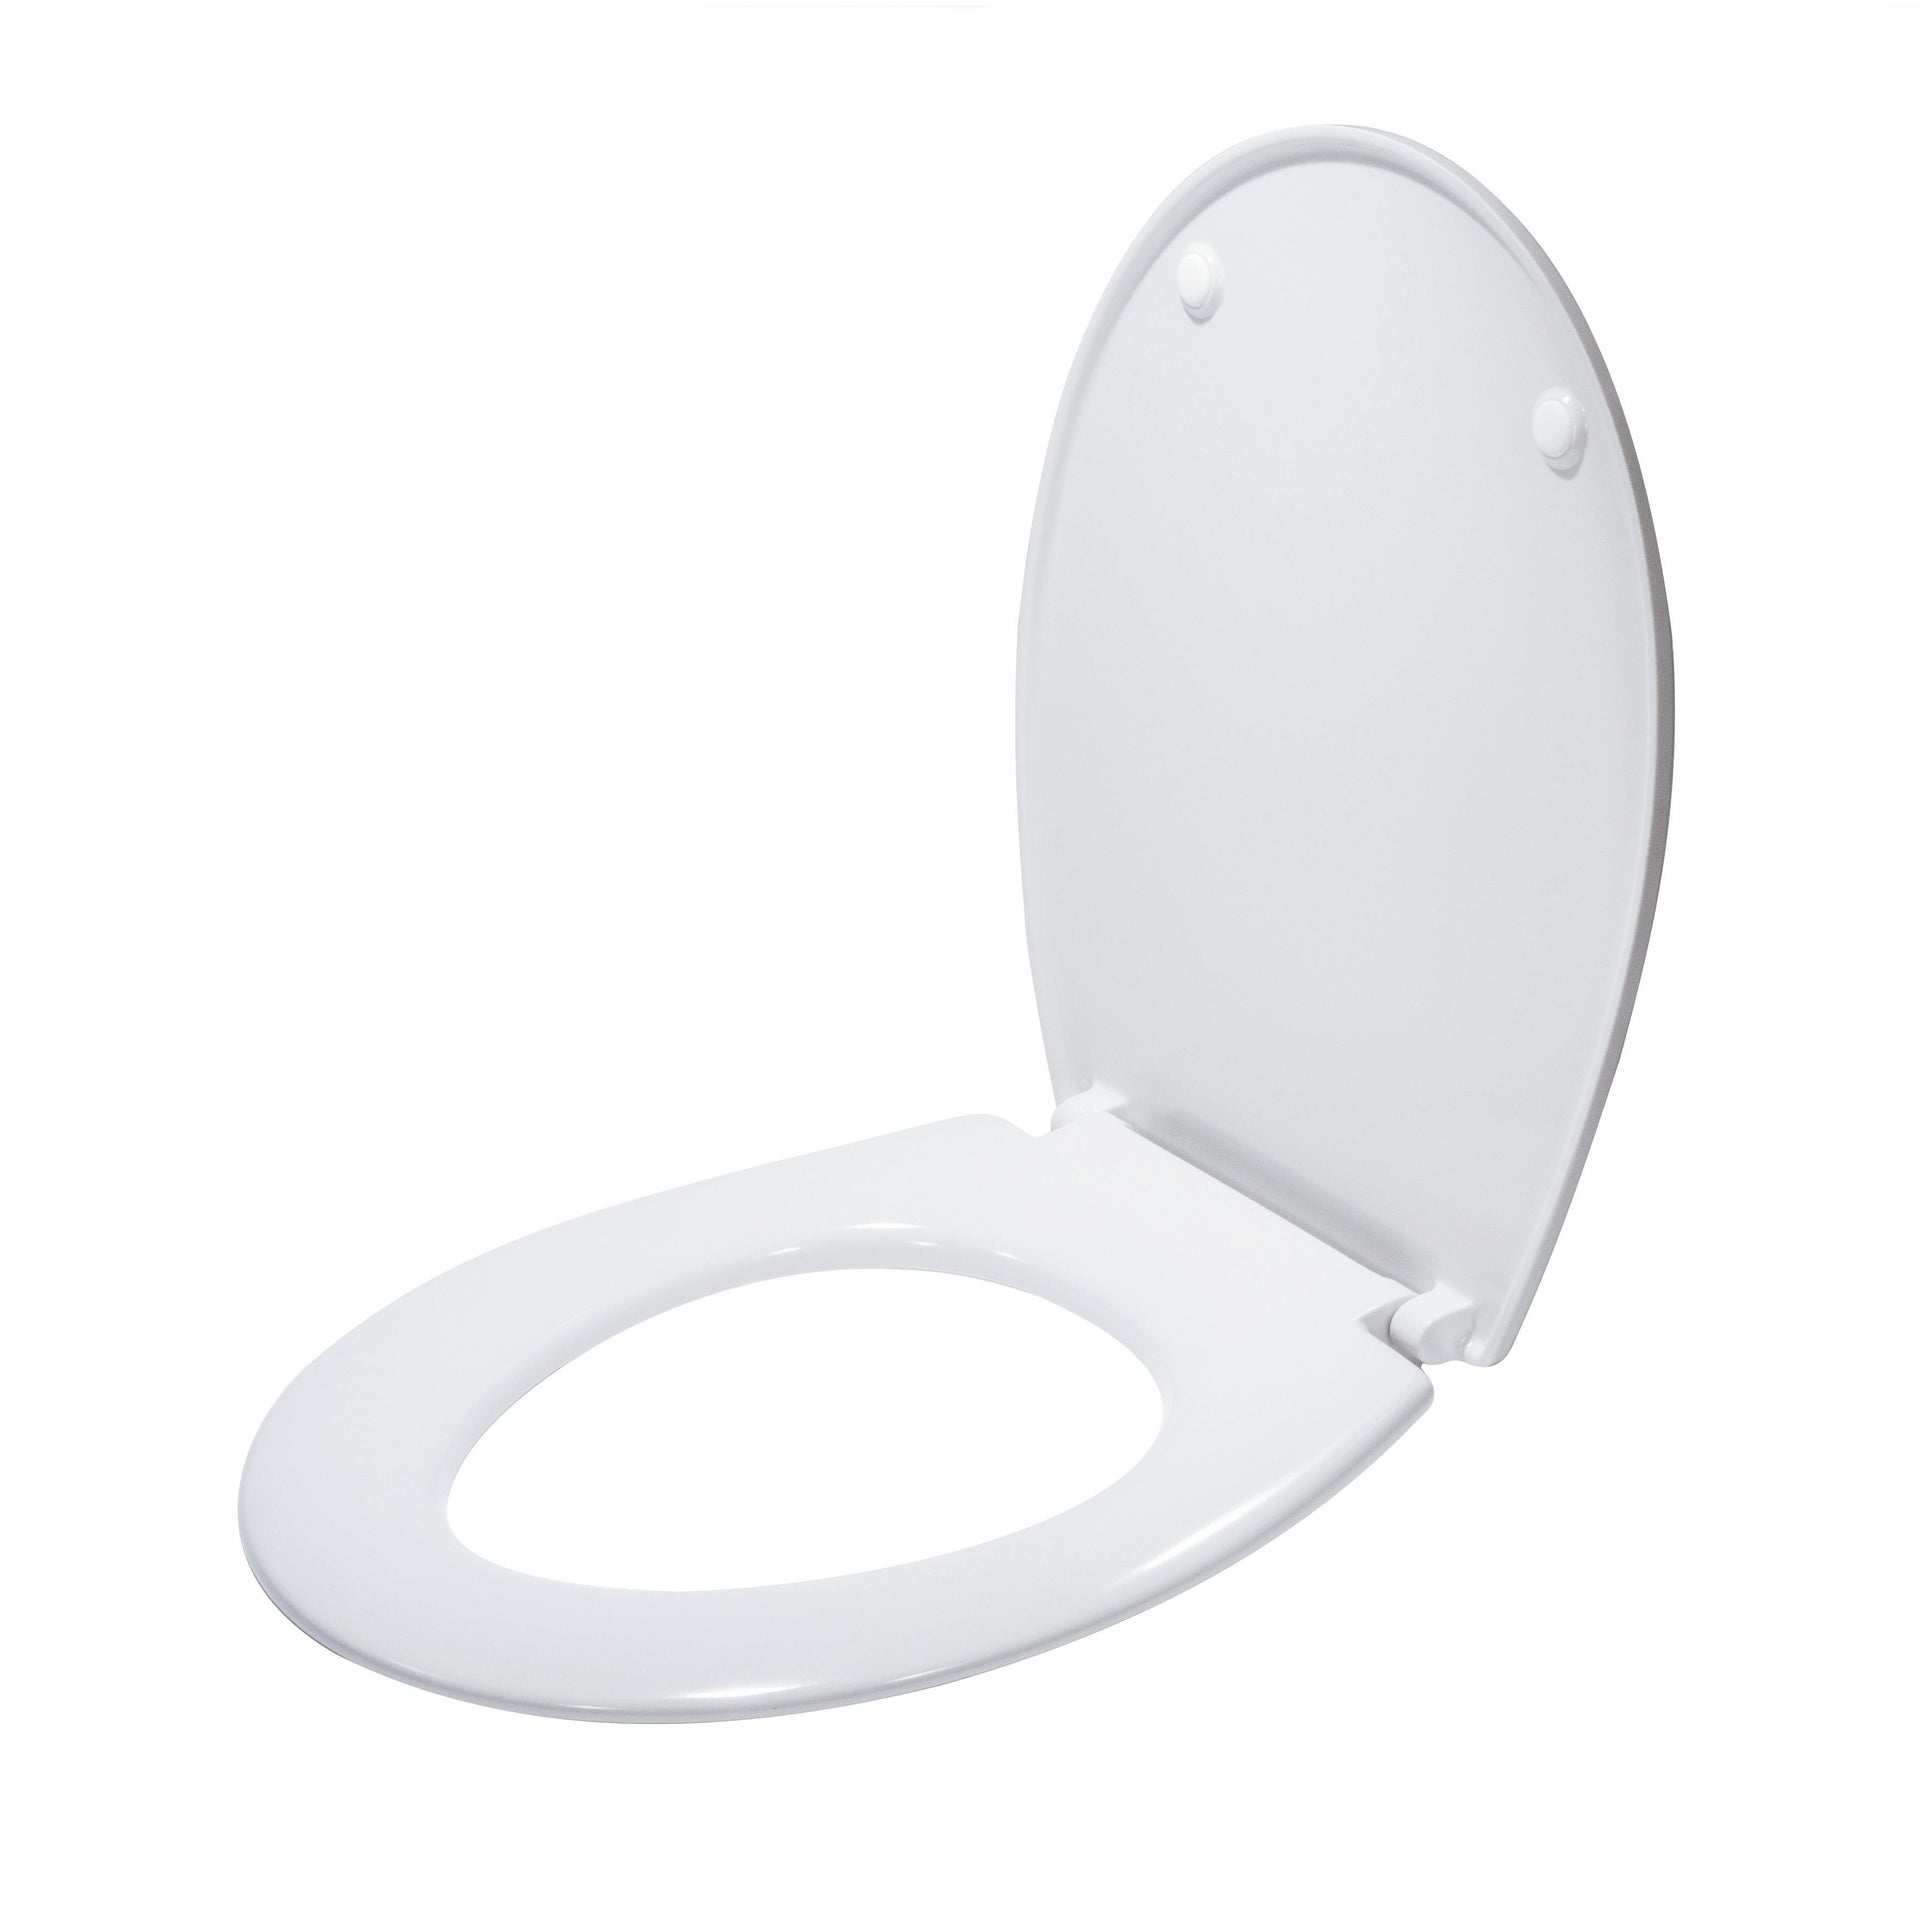 Copriwater ovale Originale per serie sanitari Miky New IDEAL STANDARD termoindurente bianco - 5